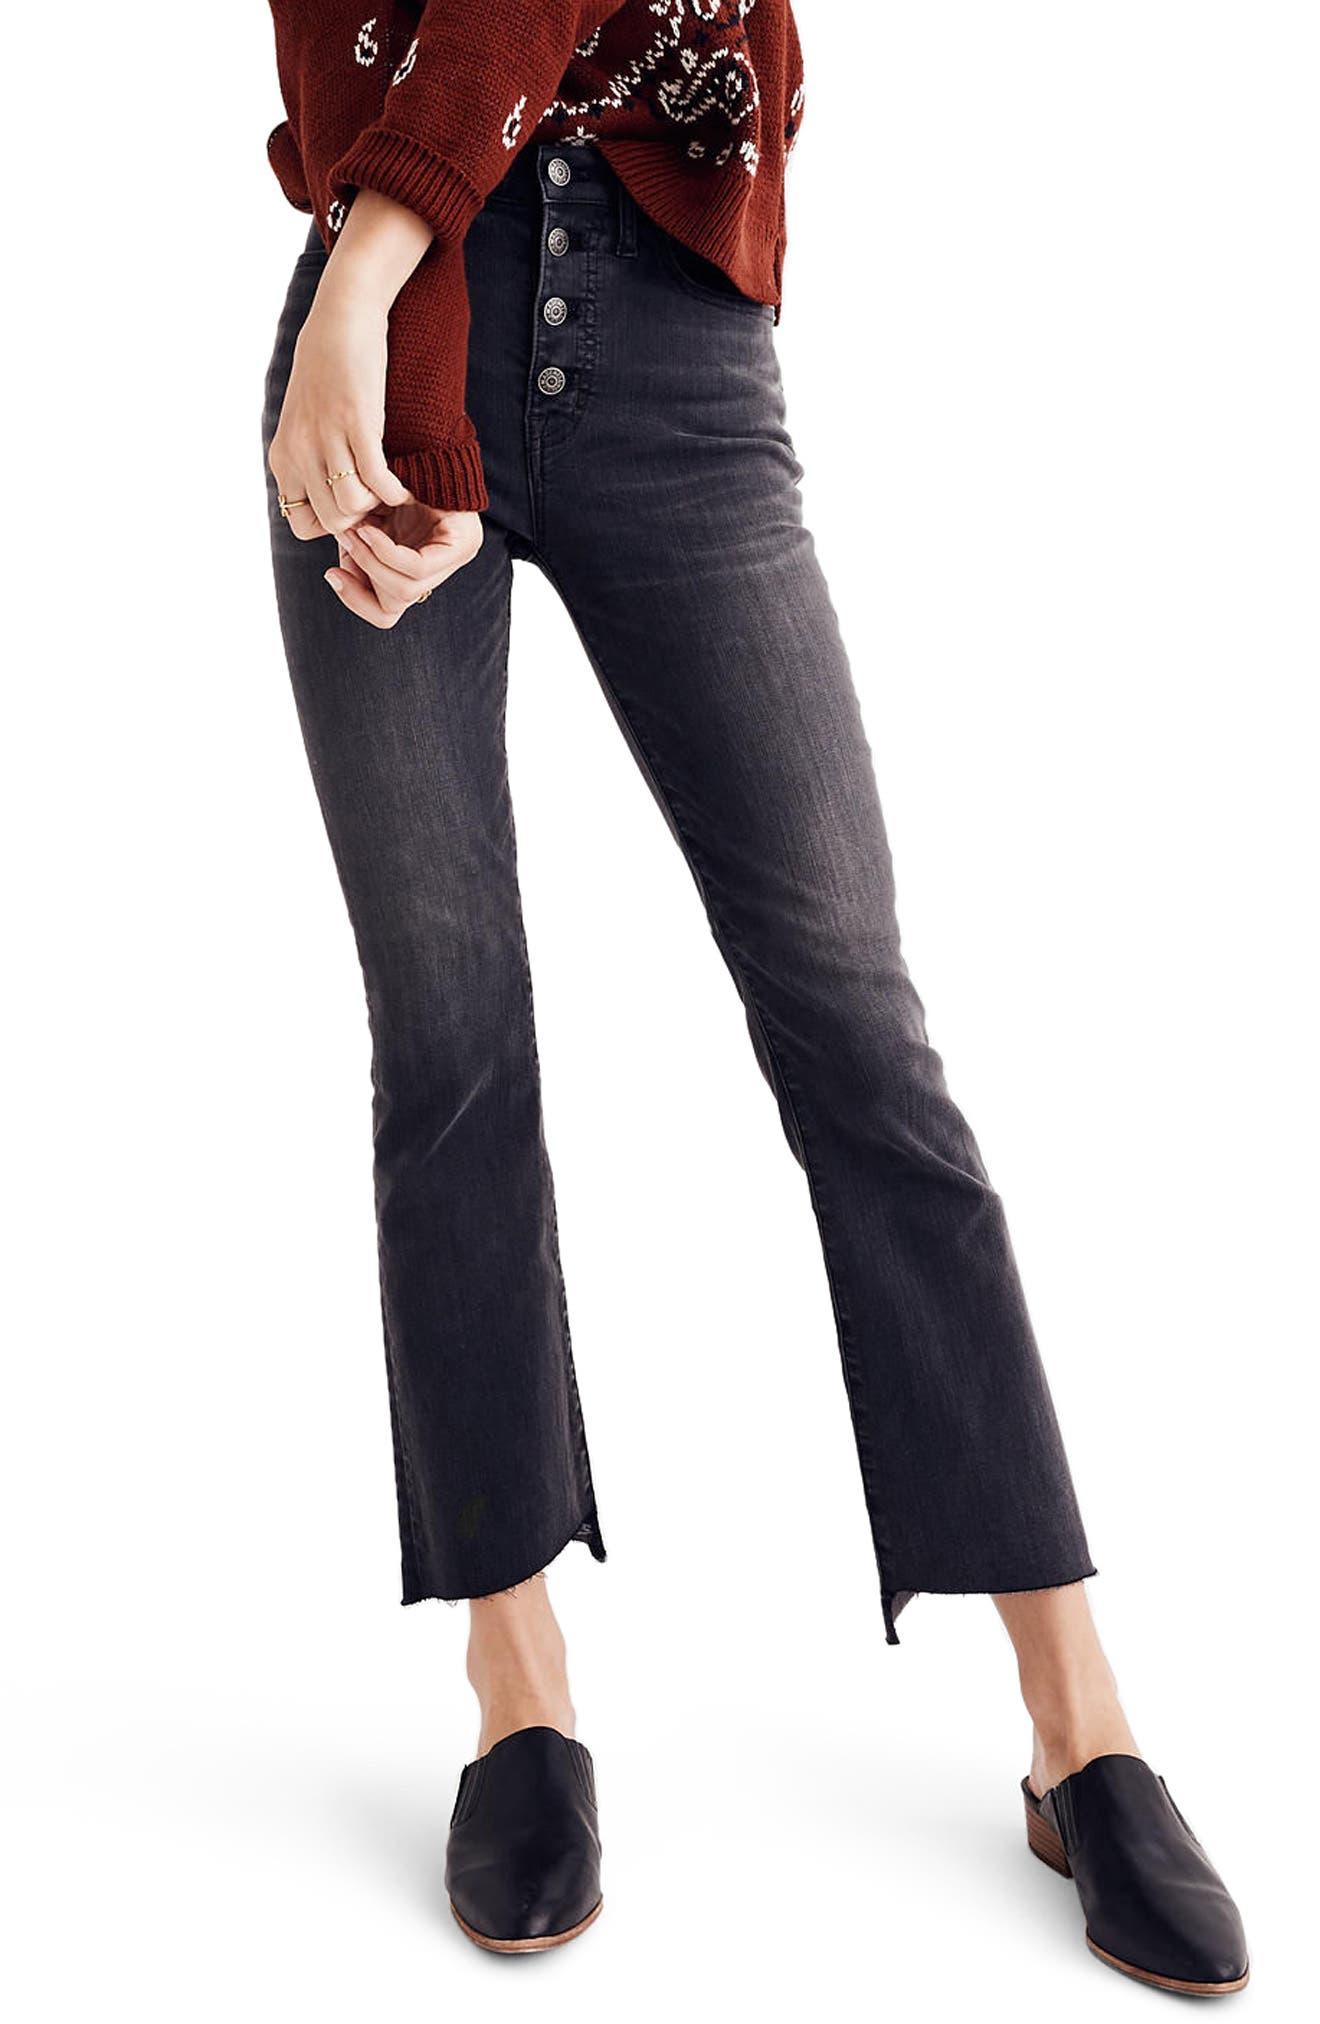 Cali Demi Bootcut Crop Jeans,                             Main thumbnail 1, color,                             Woodston Wash